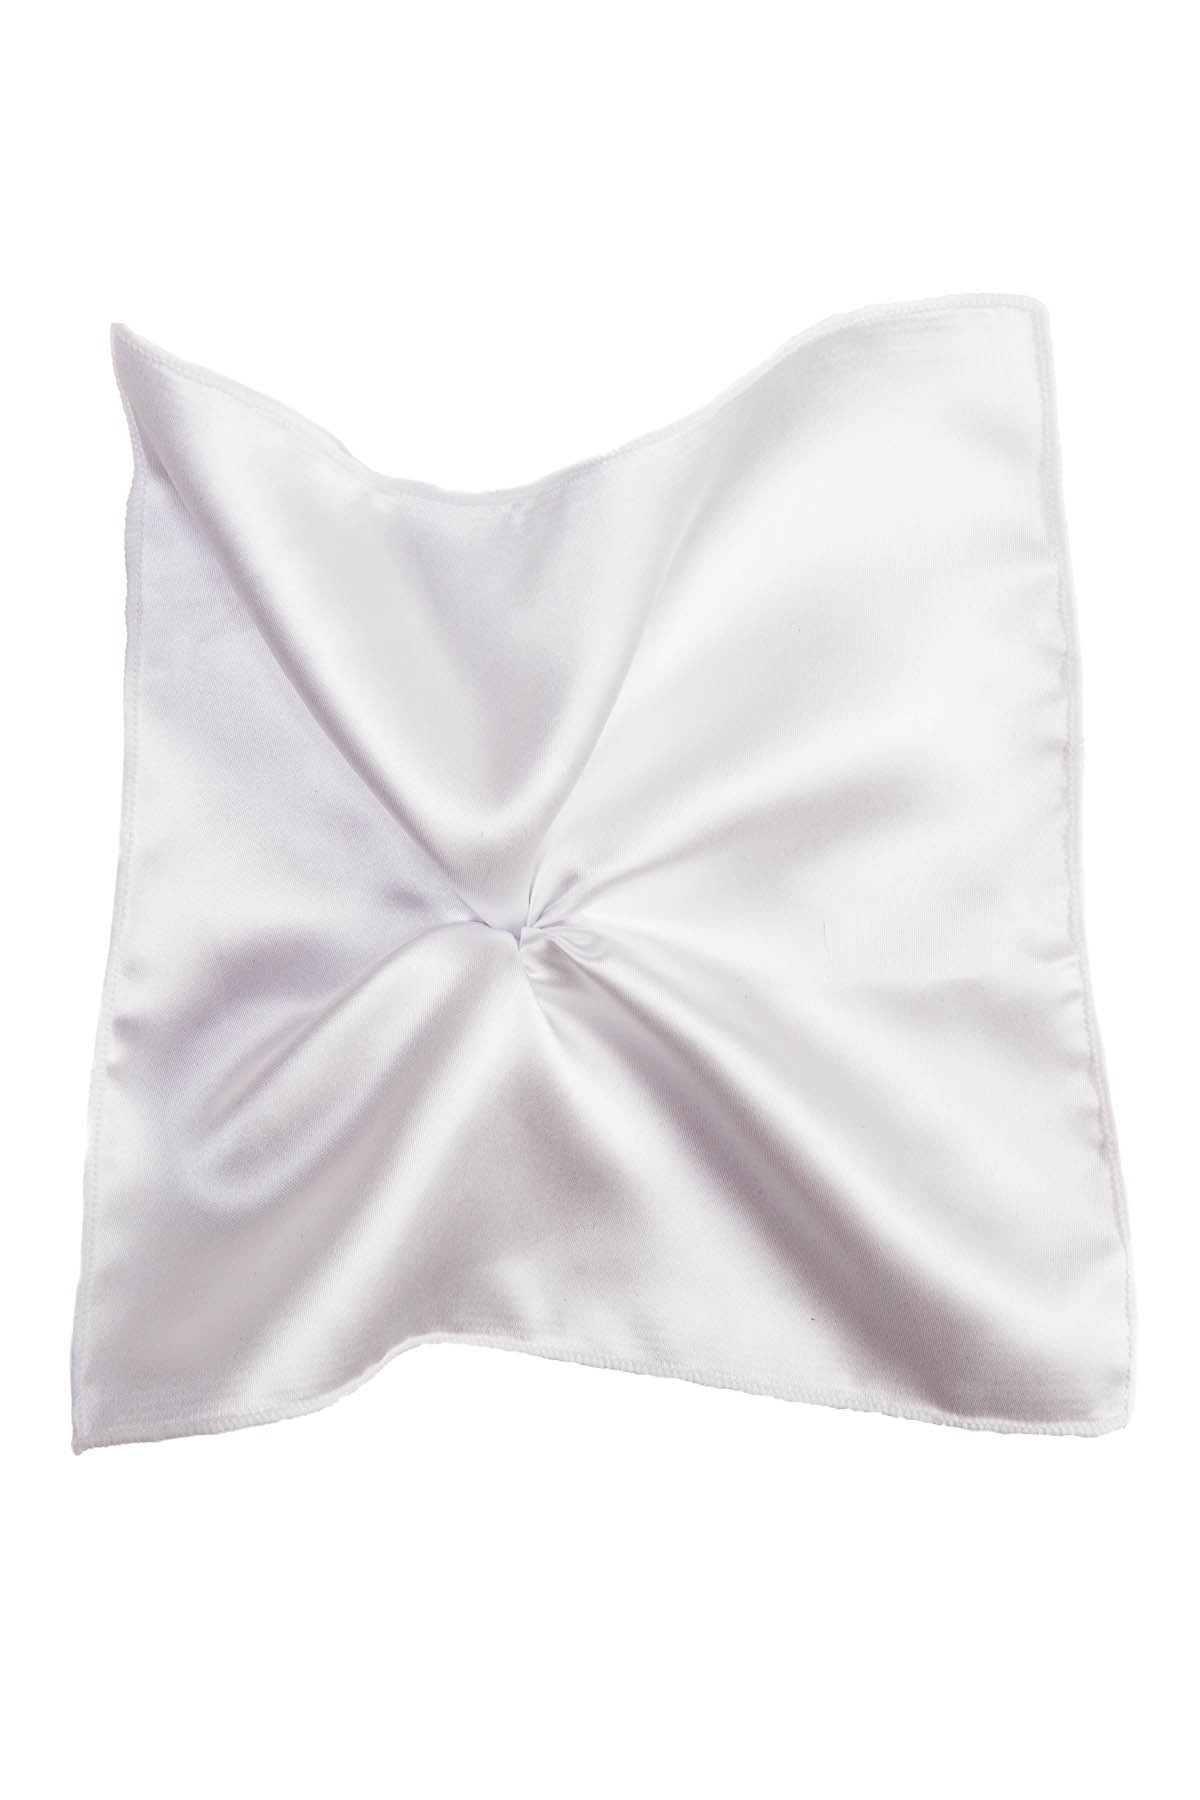 biała poszetka do garnituru na ślub